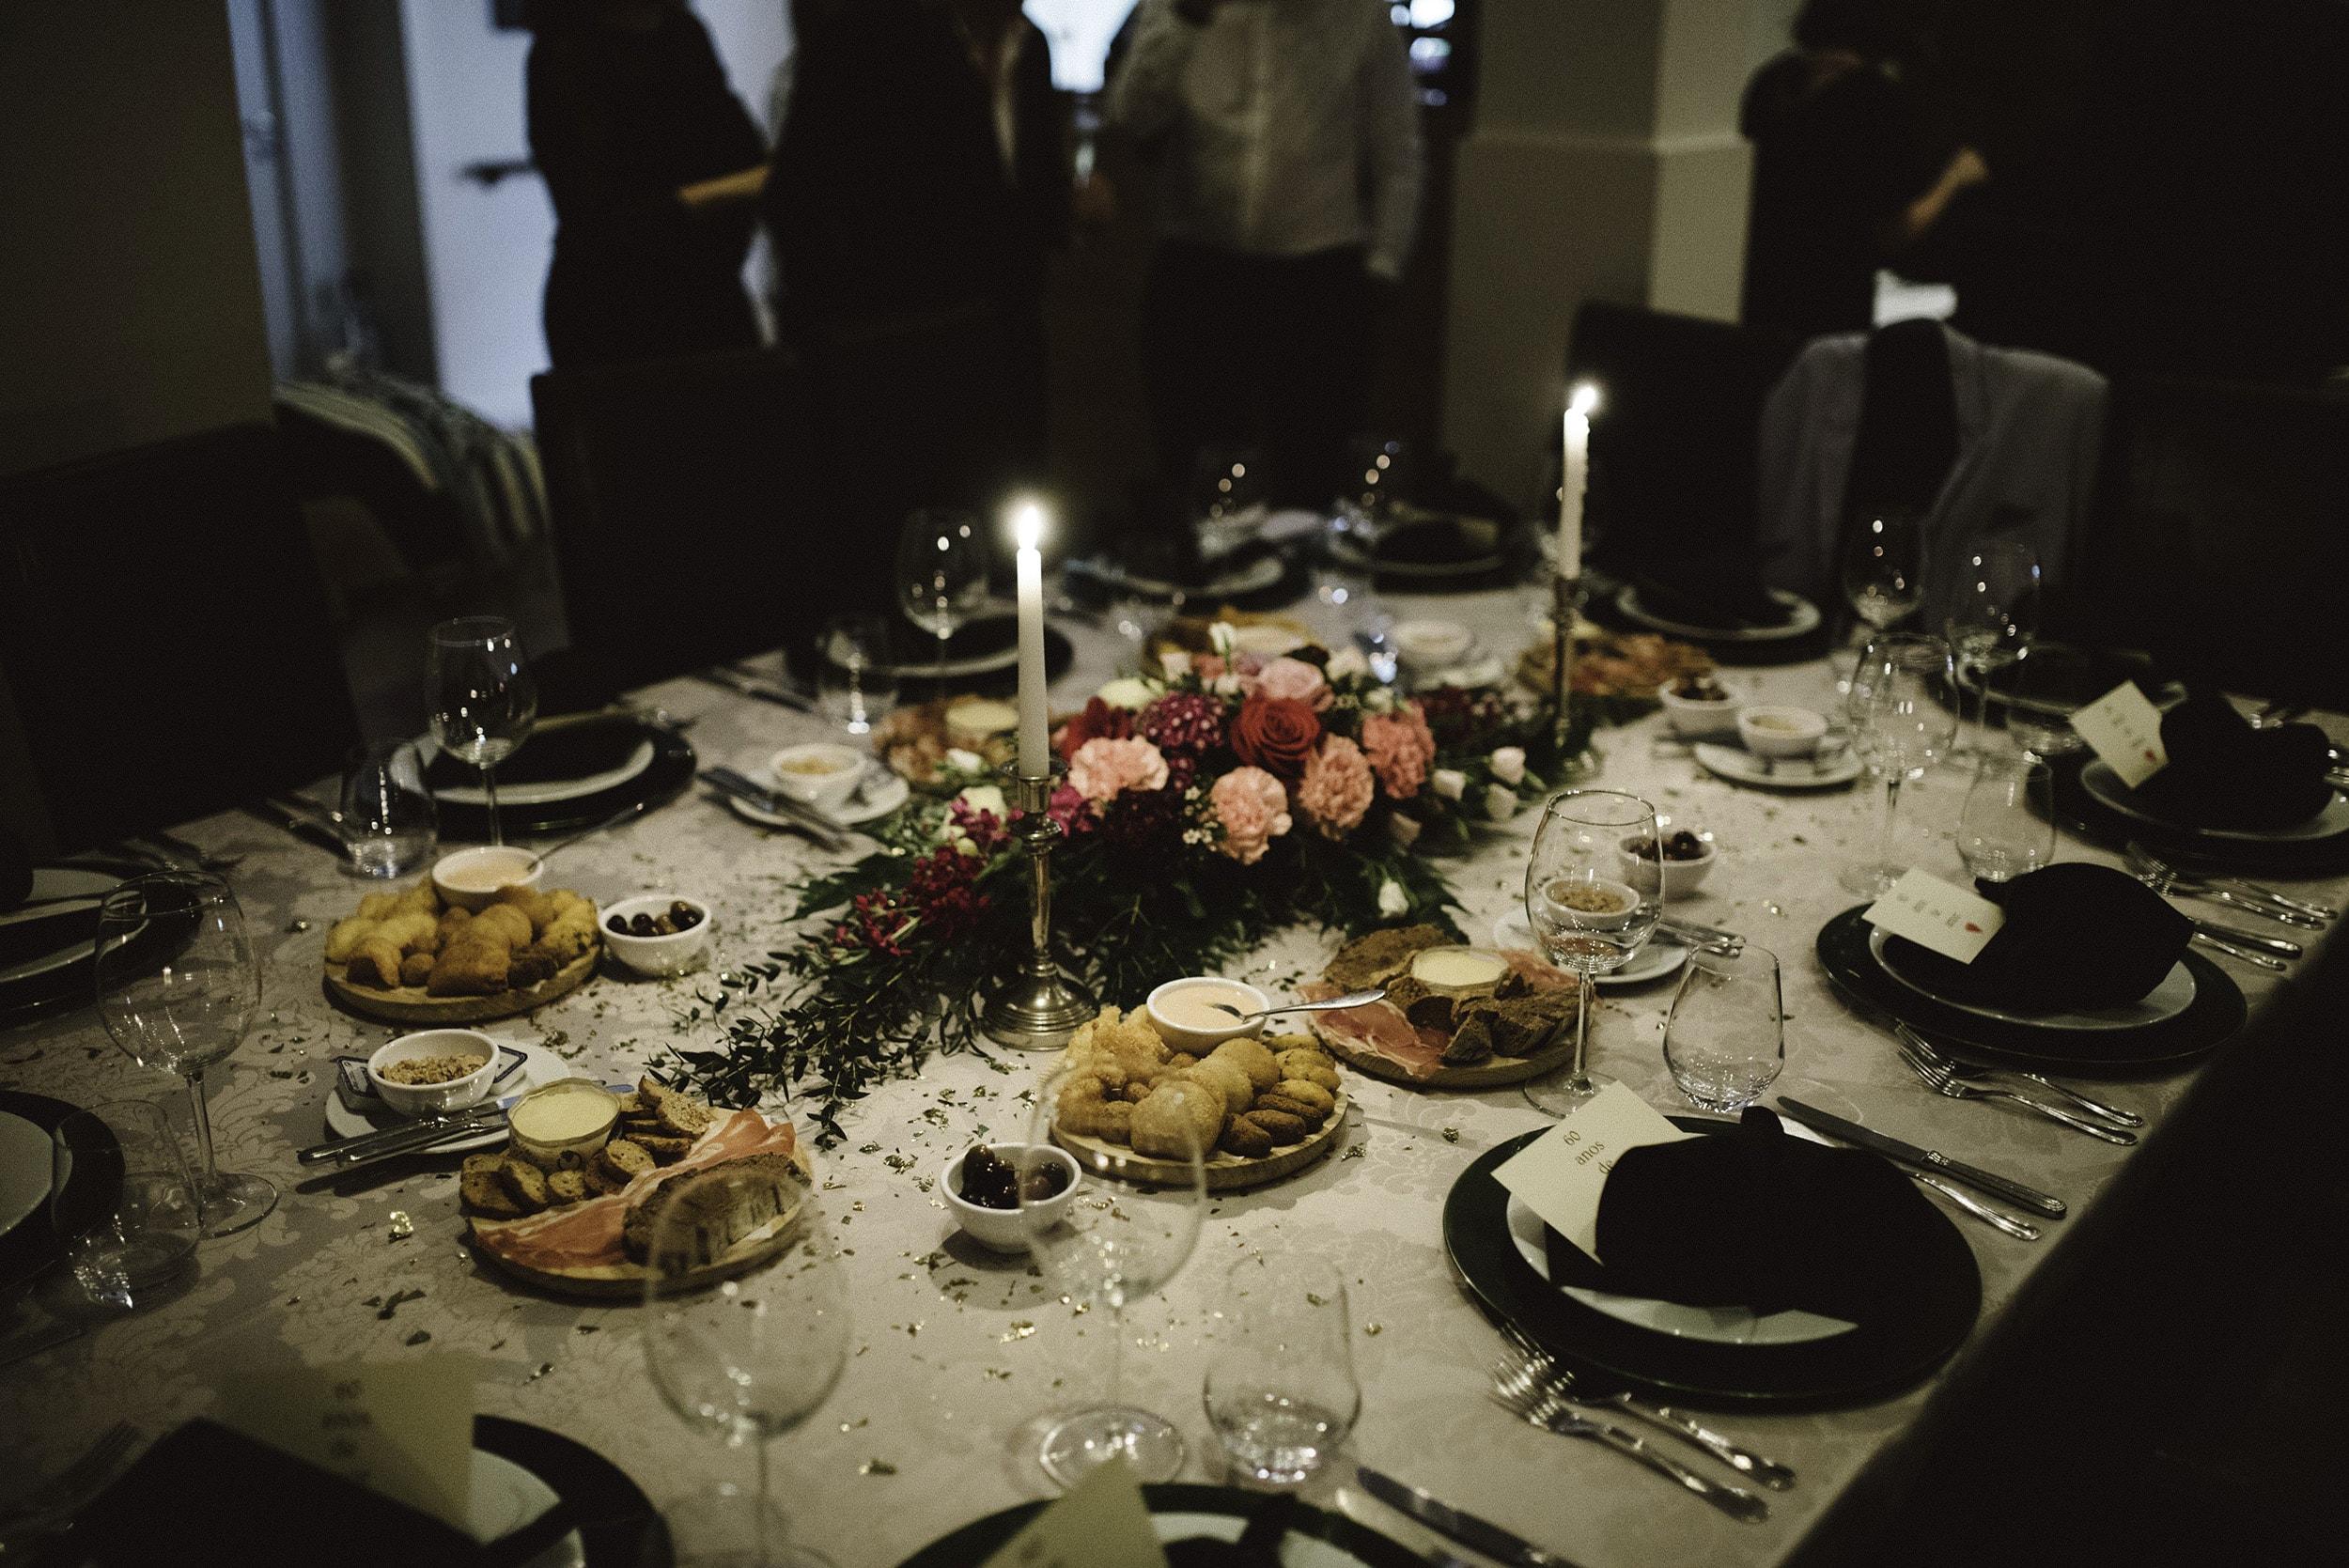 roma-organizacao-eventos-festa-de-aniversario-17